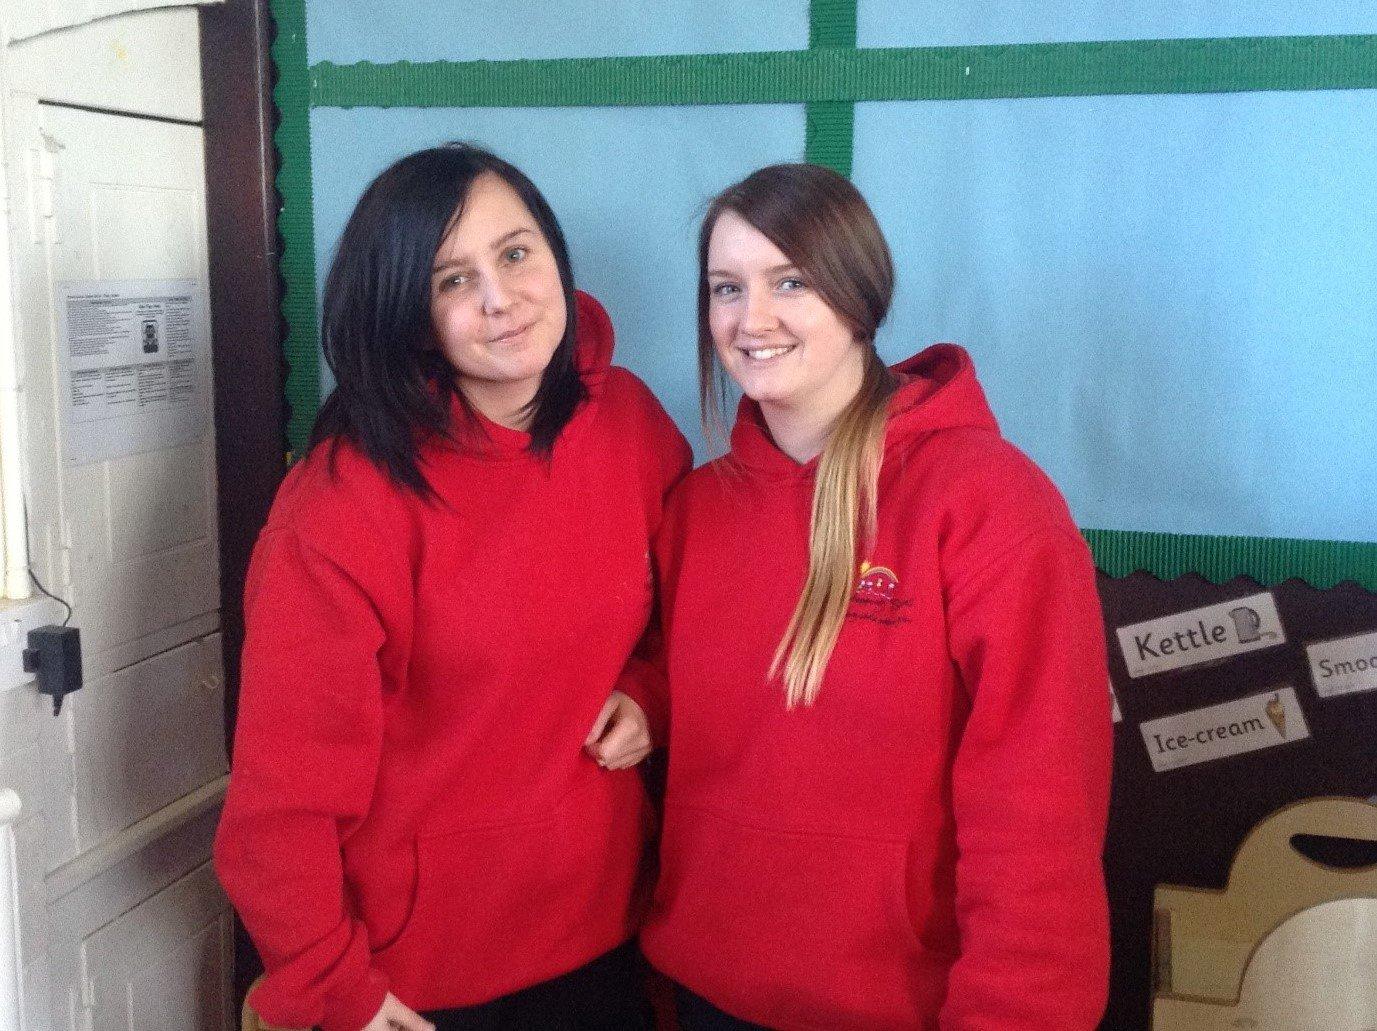 Pre-School Teachers Cassie Killen and Zoe Eagles